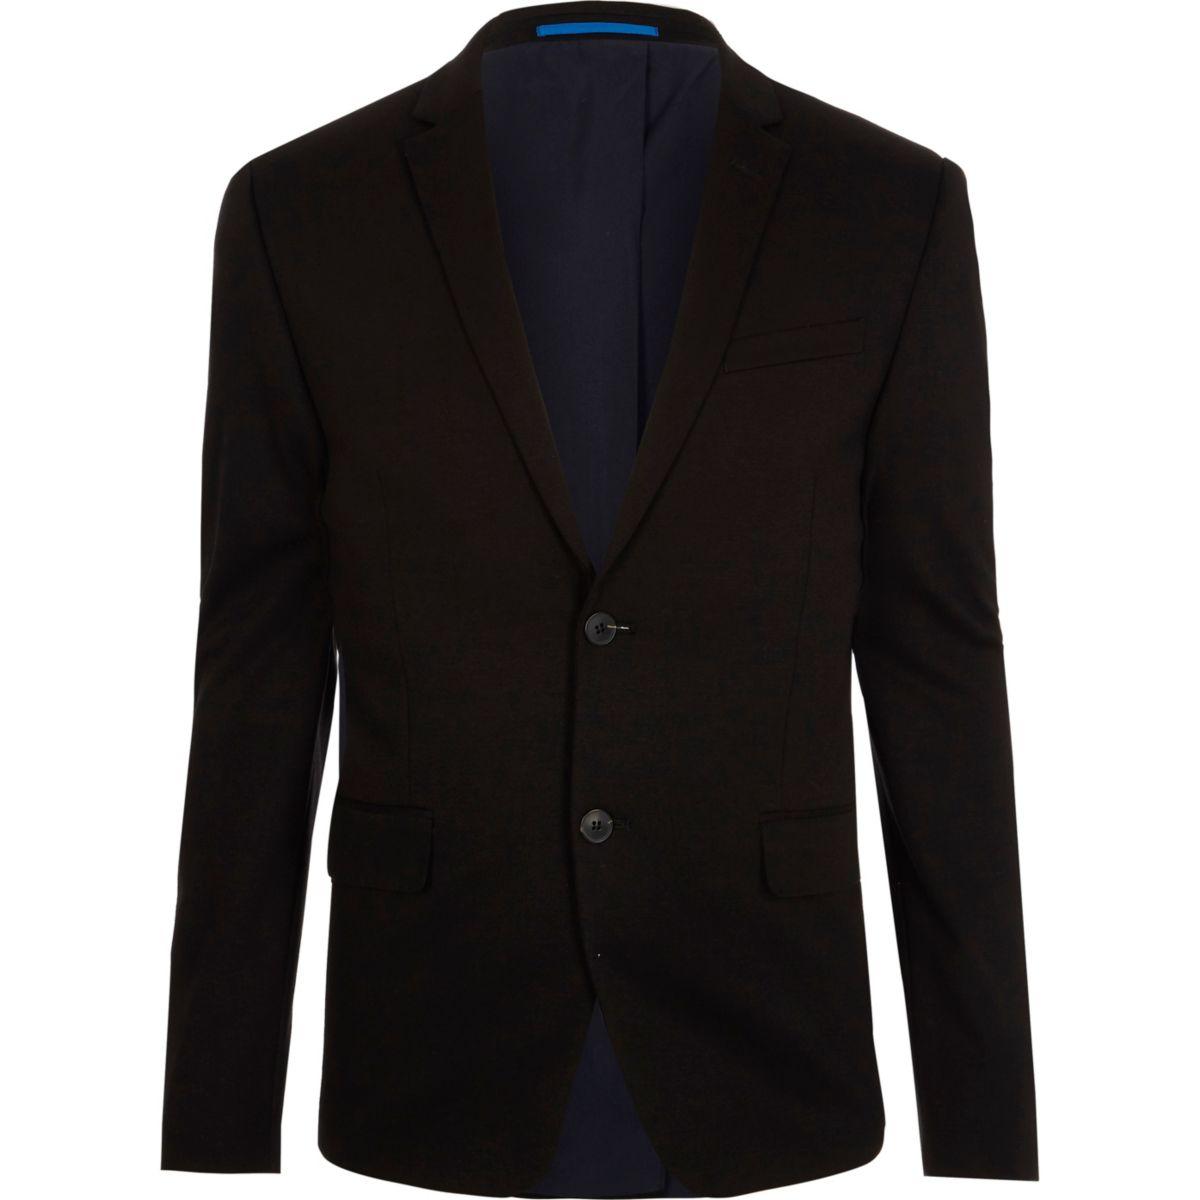 Black jersey skinny fit suit jacket